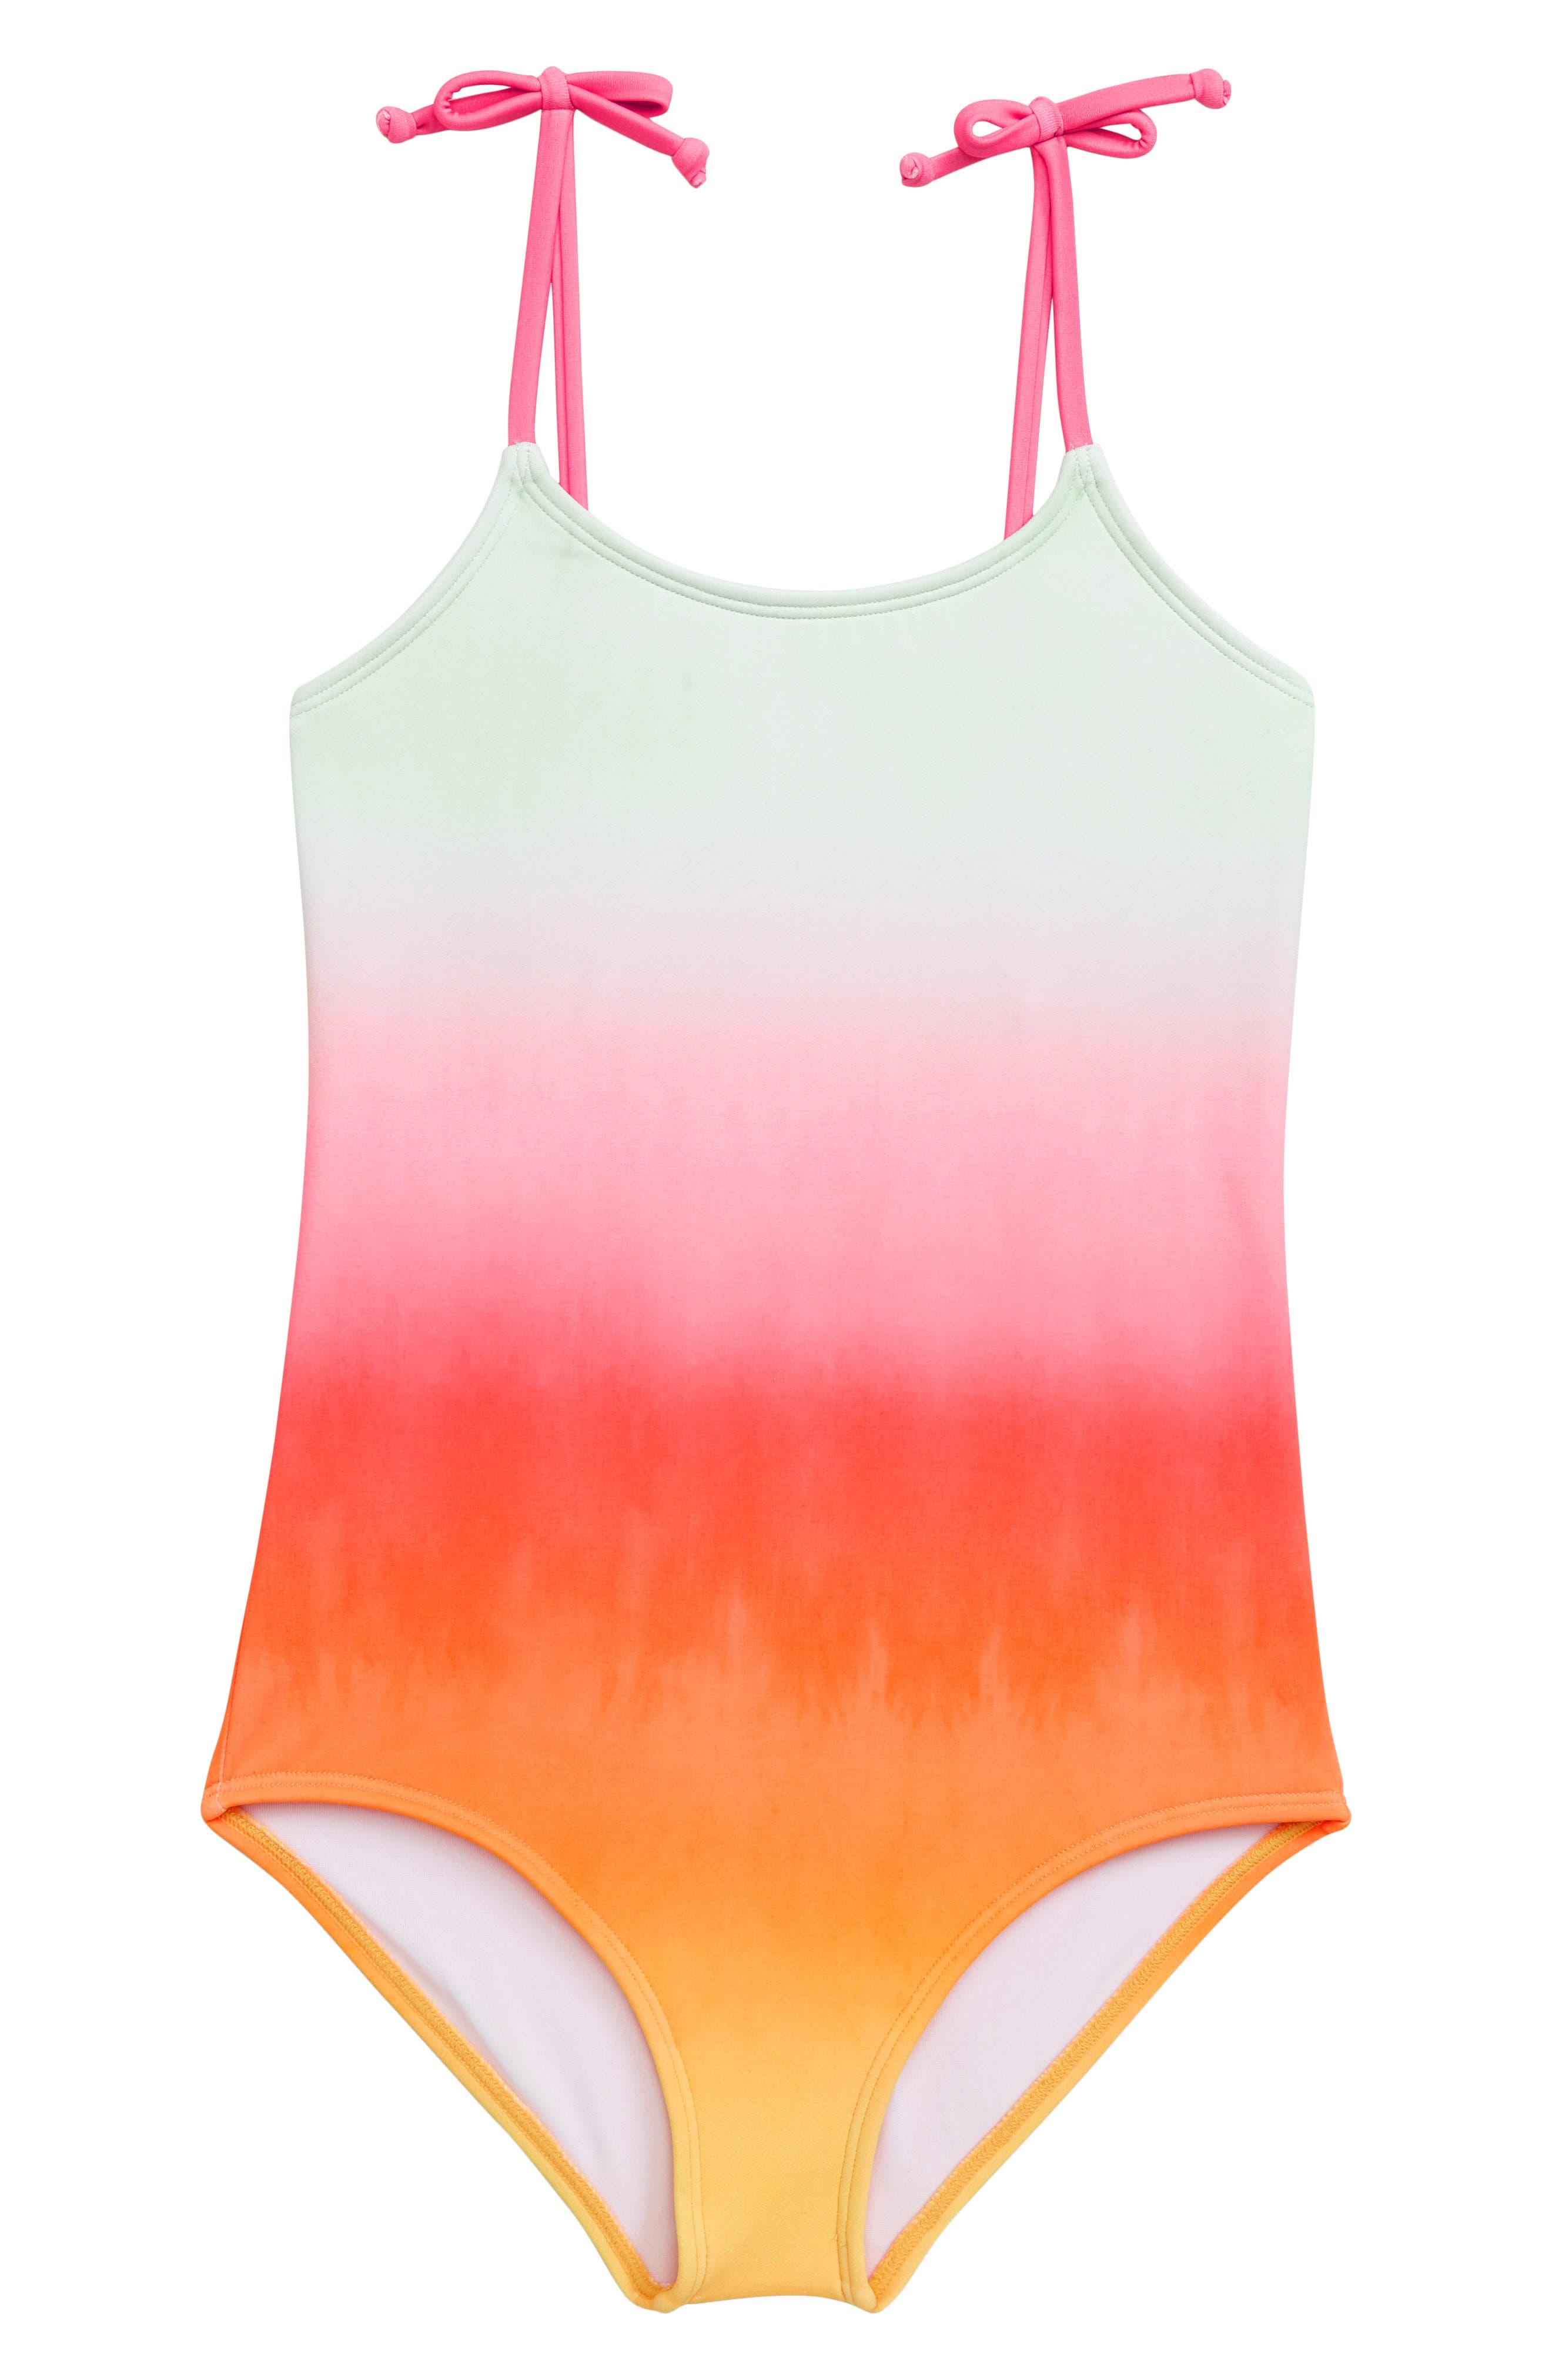 Hazy Daze One-Piece Swimsuit, Main, color, 950